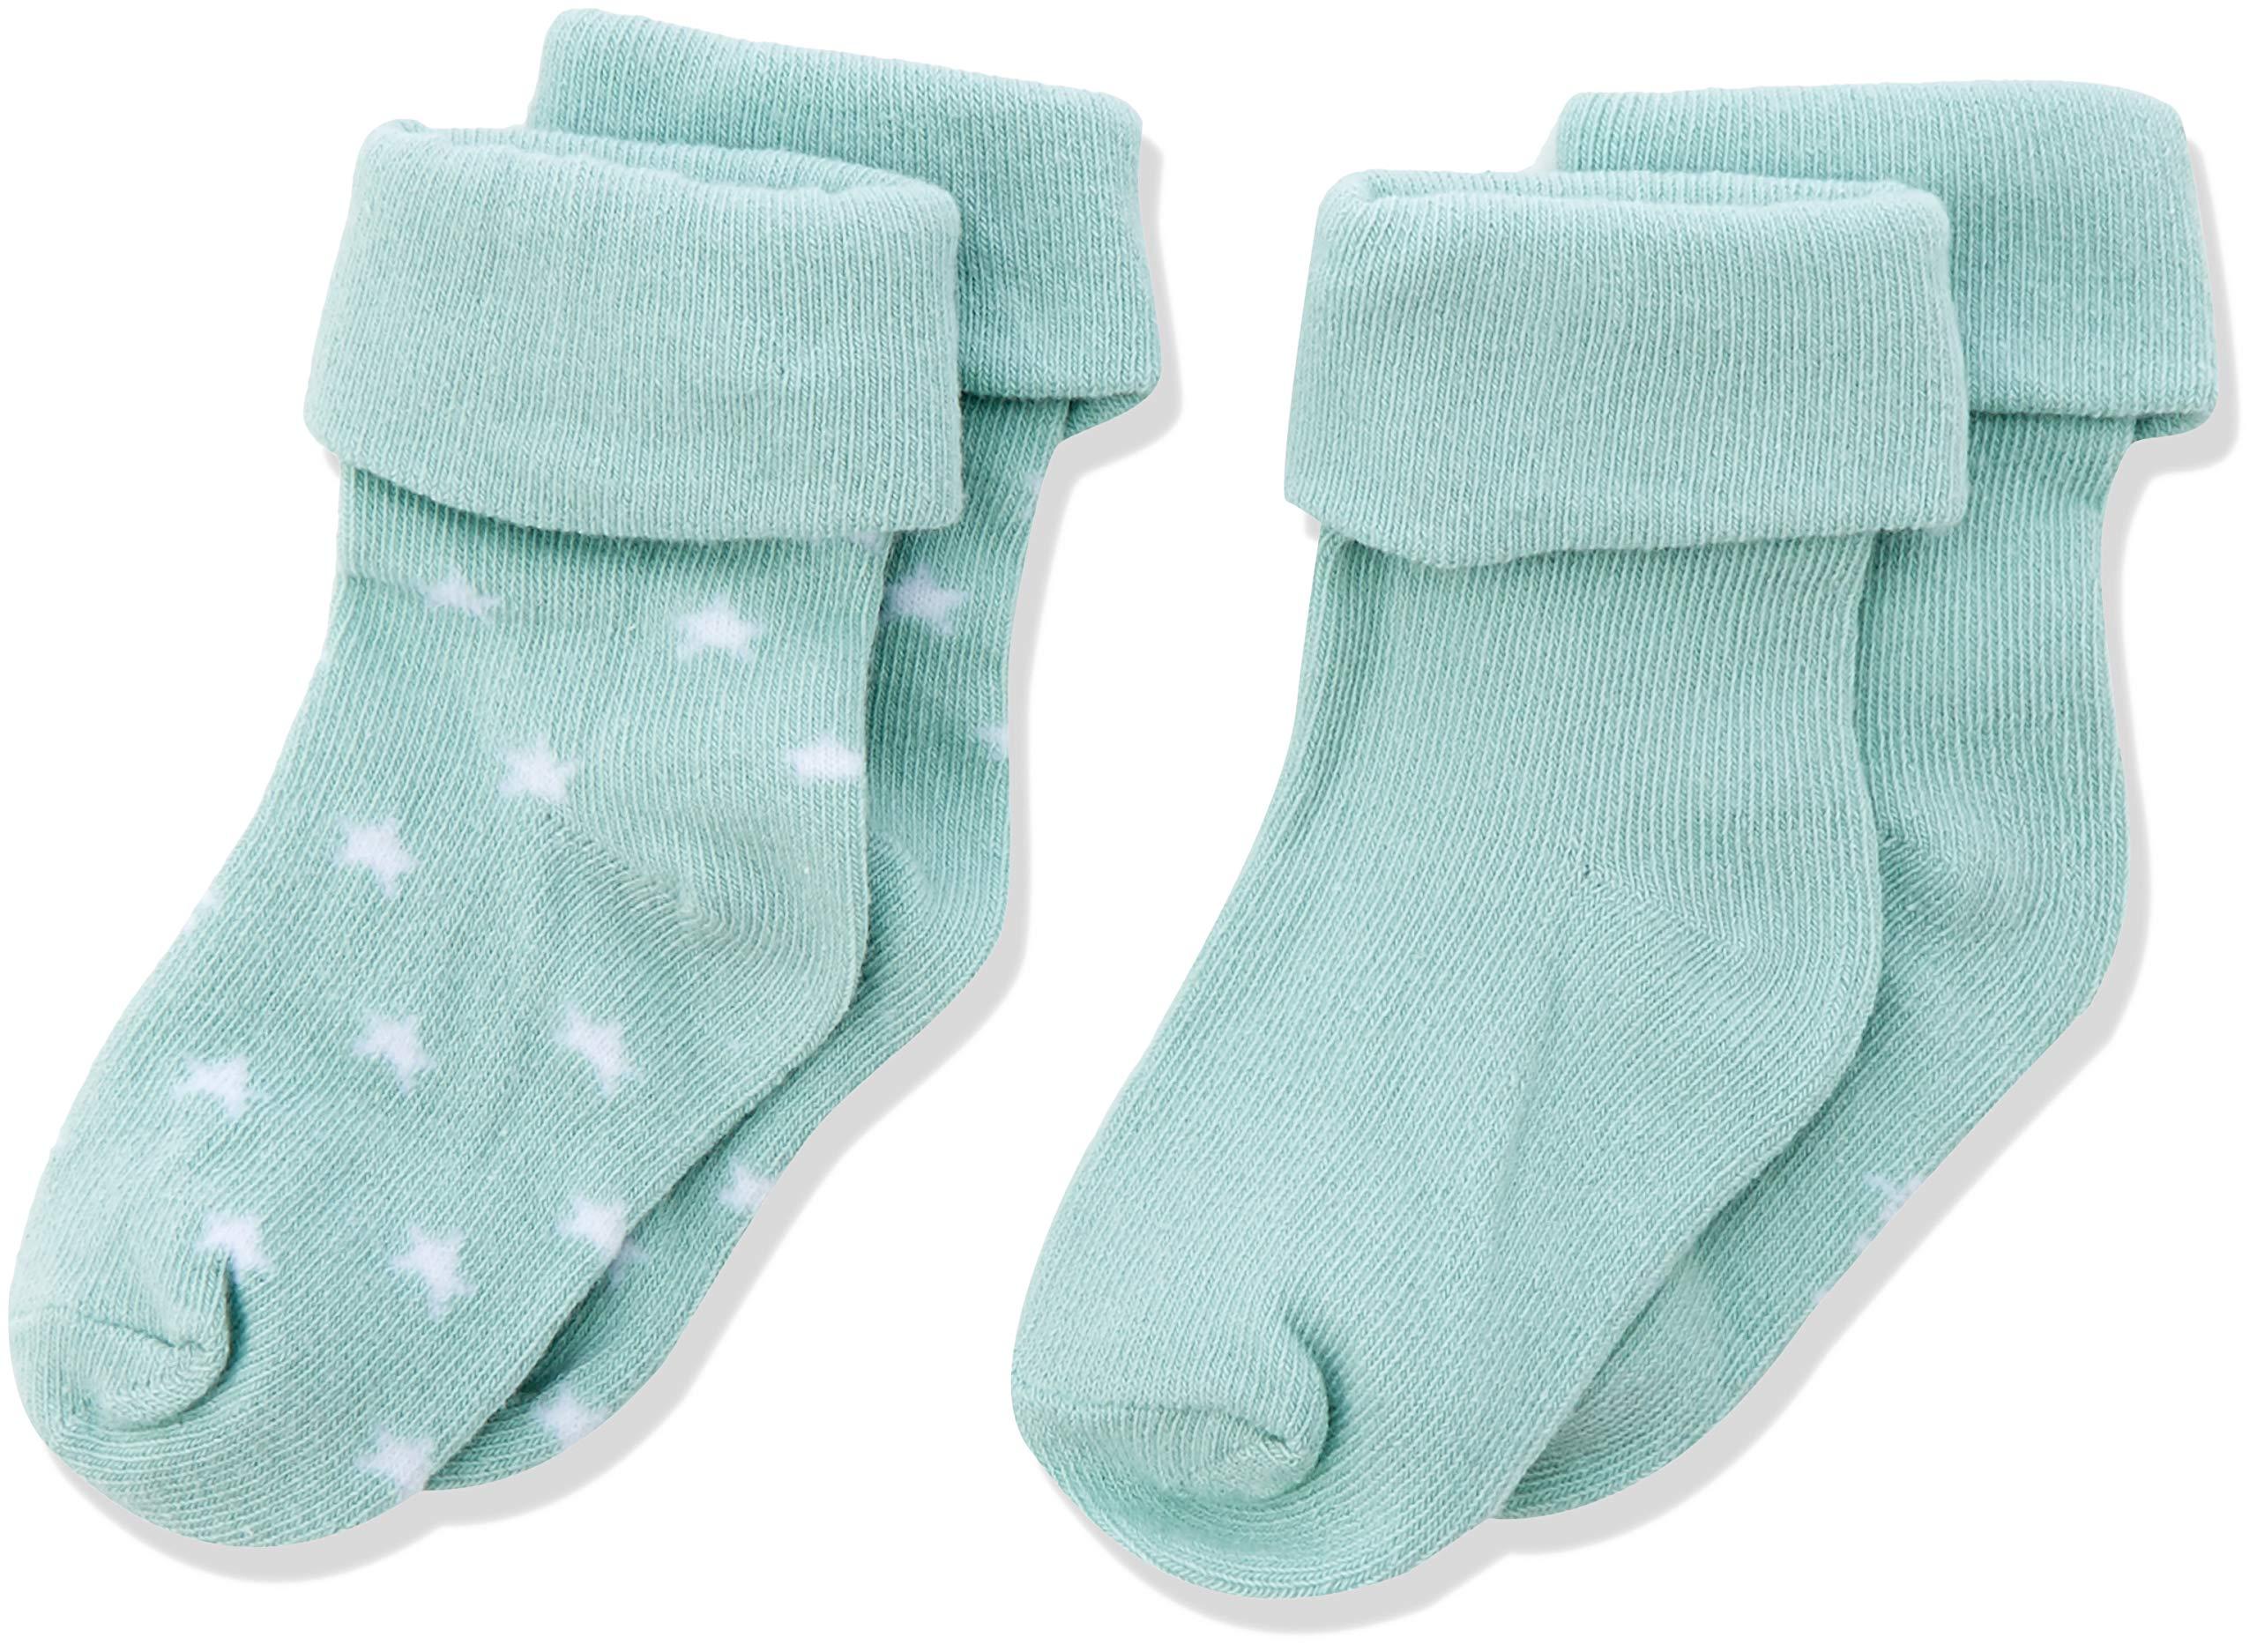 Noppies Calcetines para Bebés 1